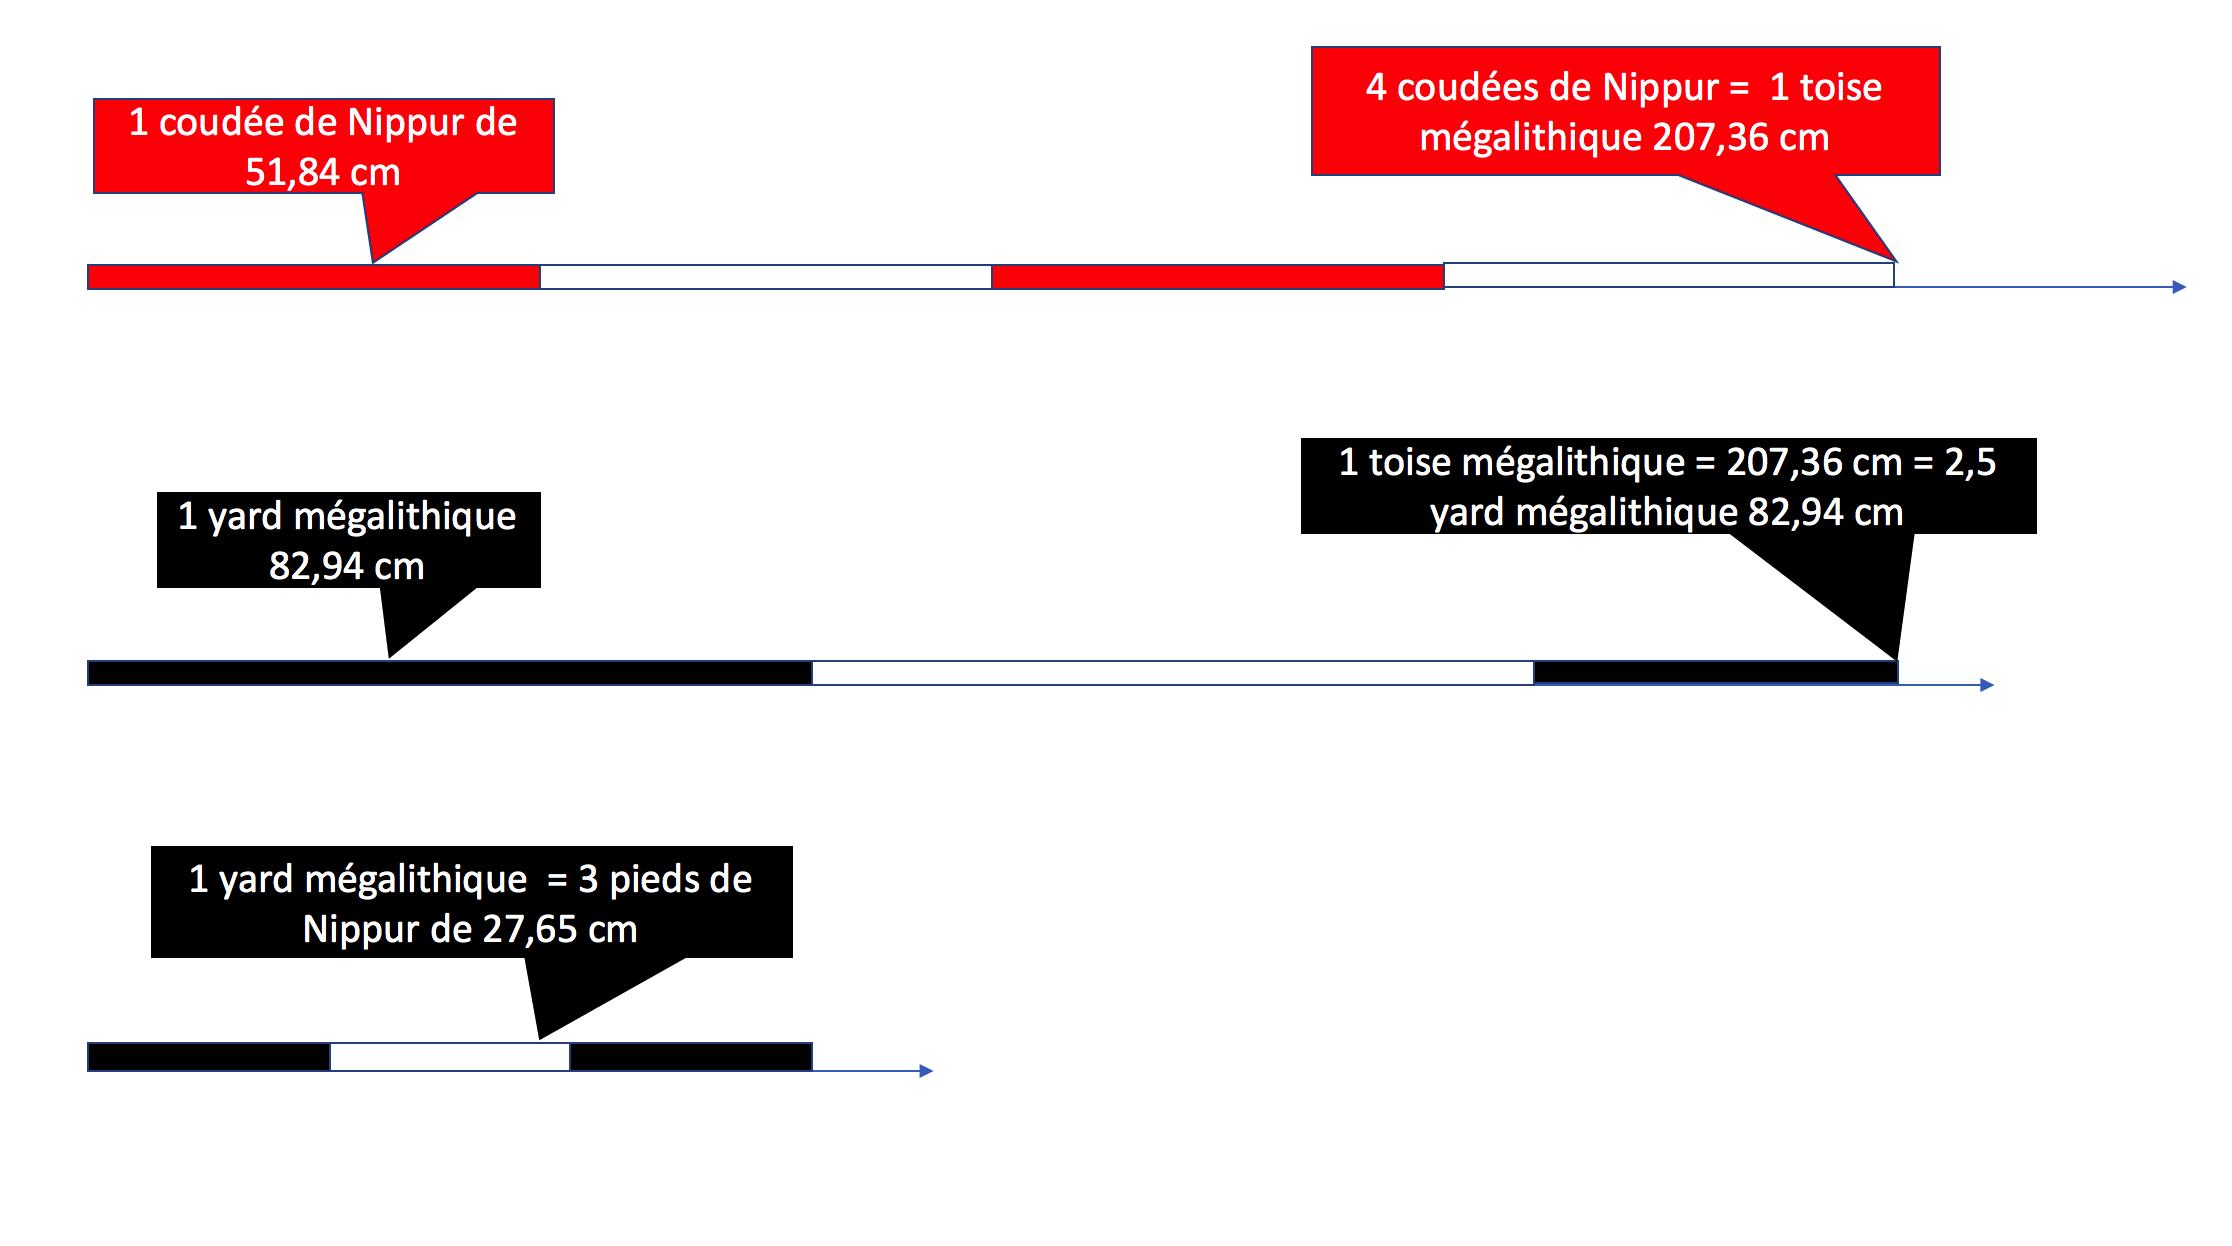 2017-10-18 21:51:13